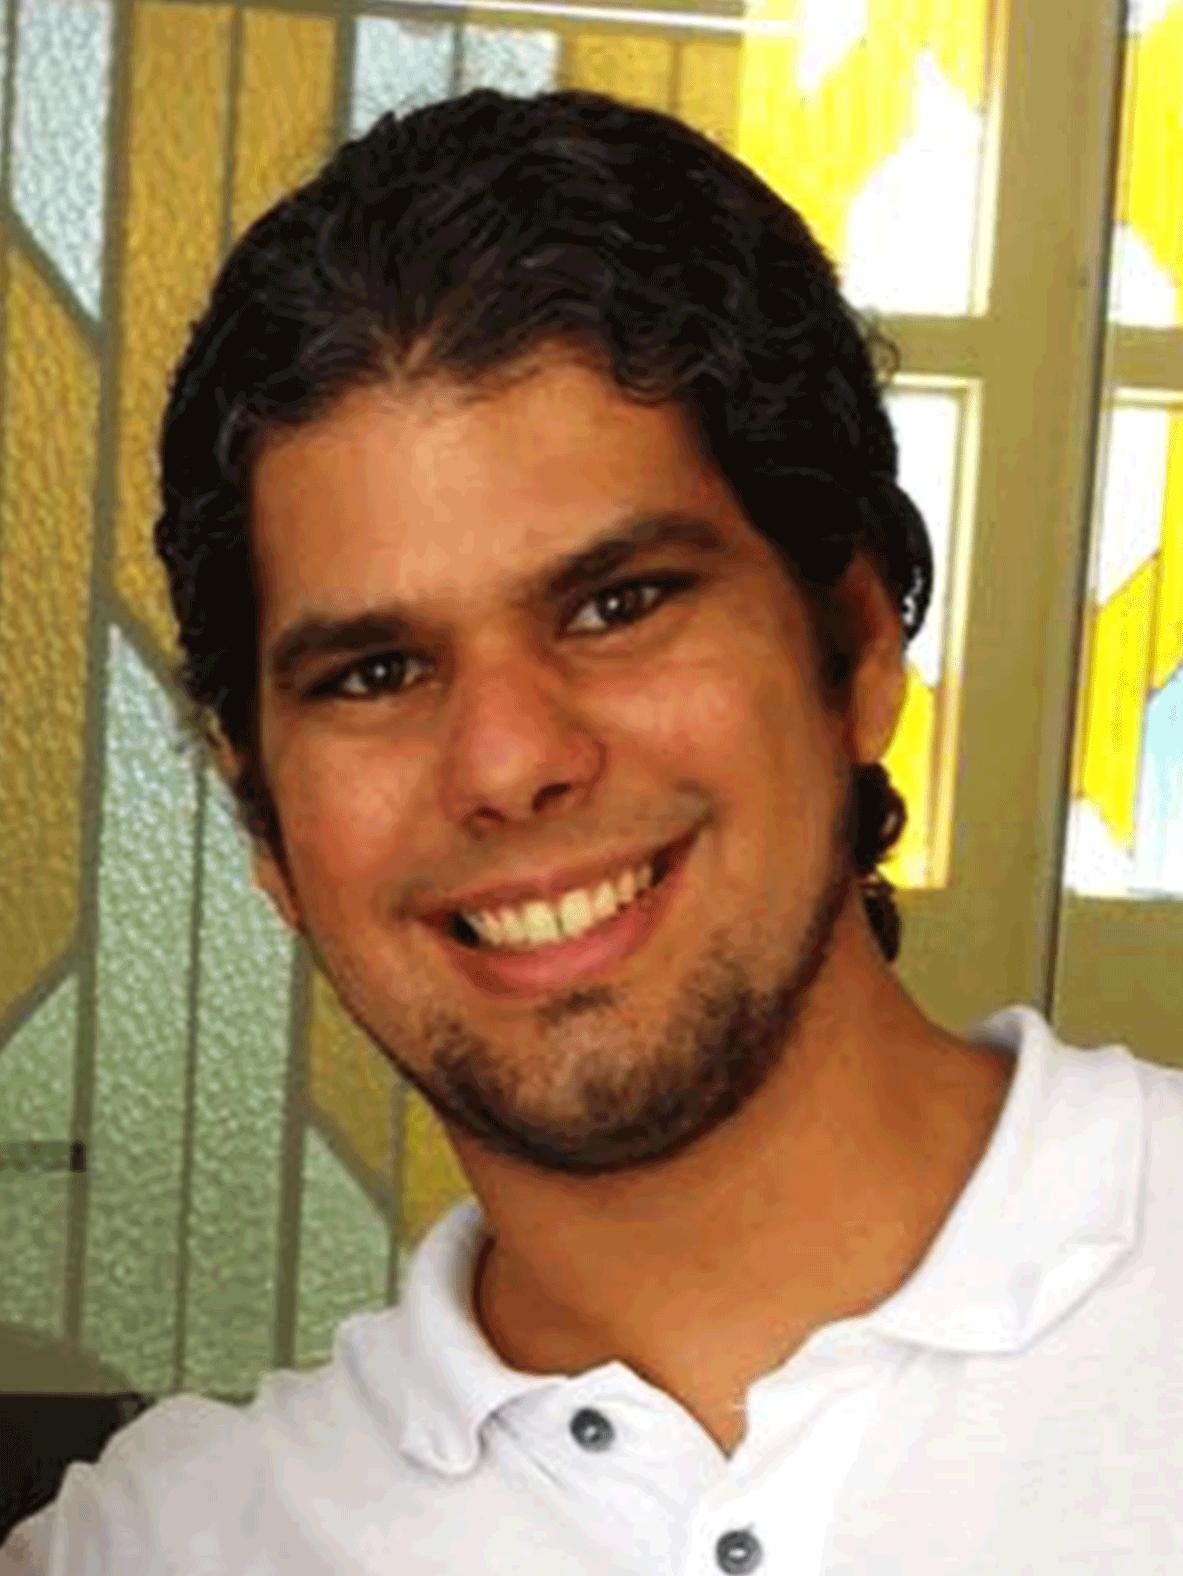 Go to Antunes Vila Nova Neto's profile